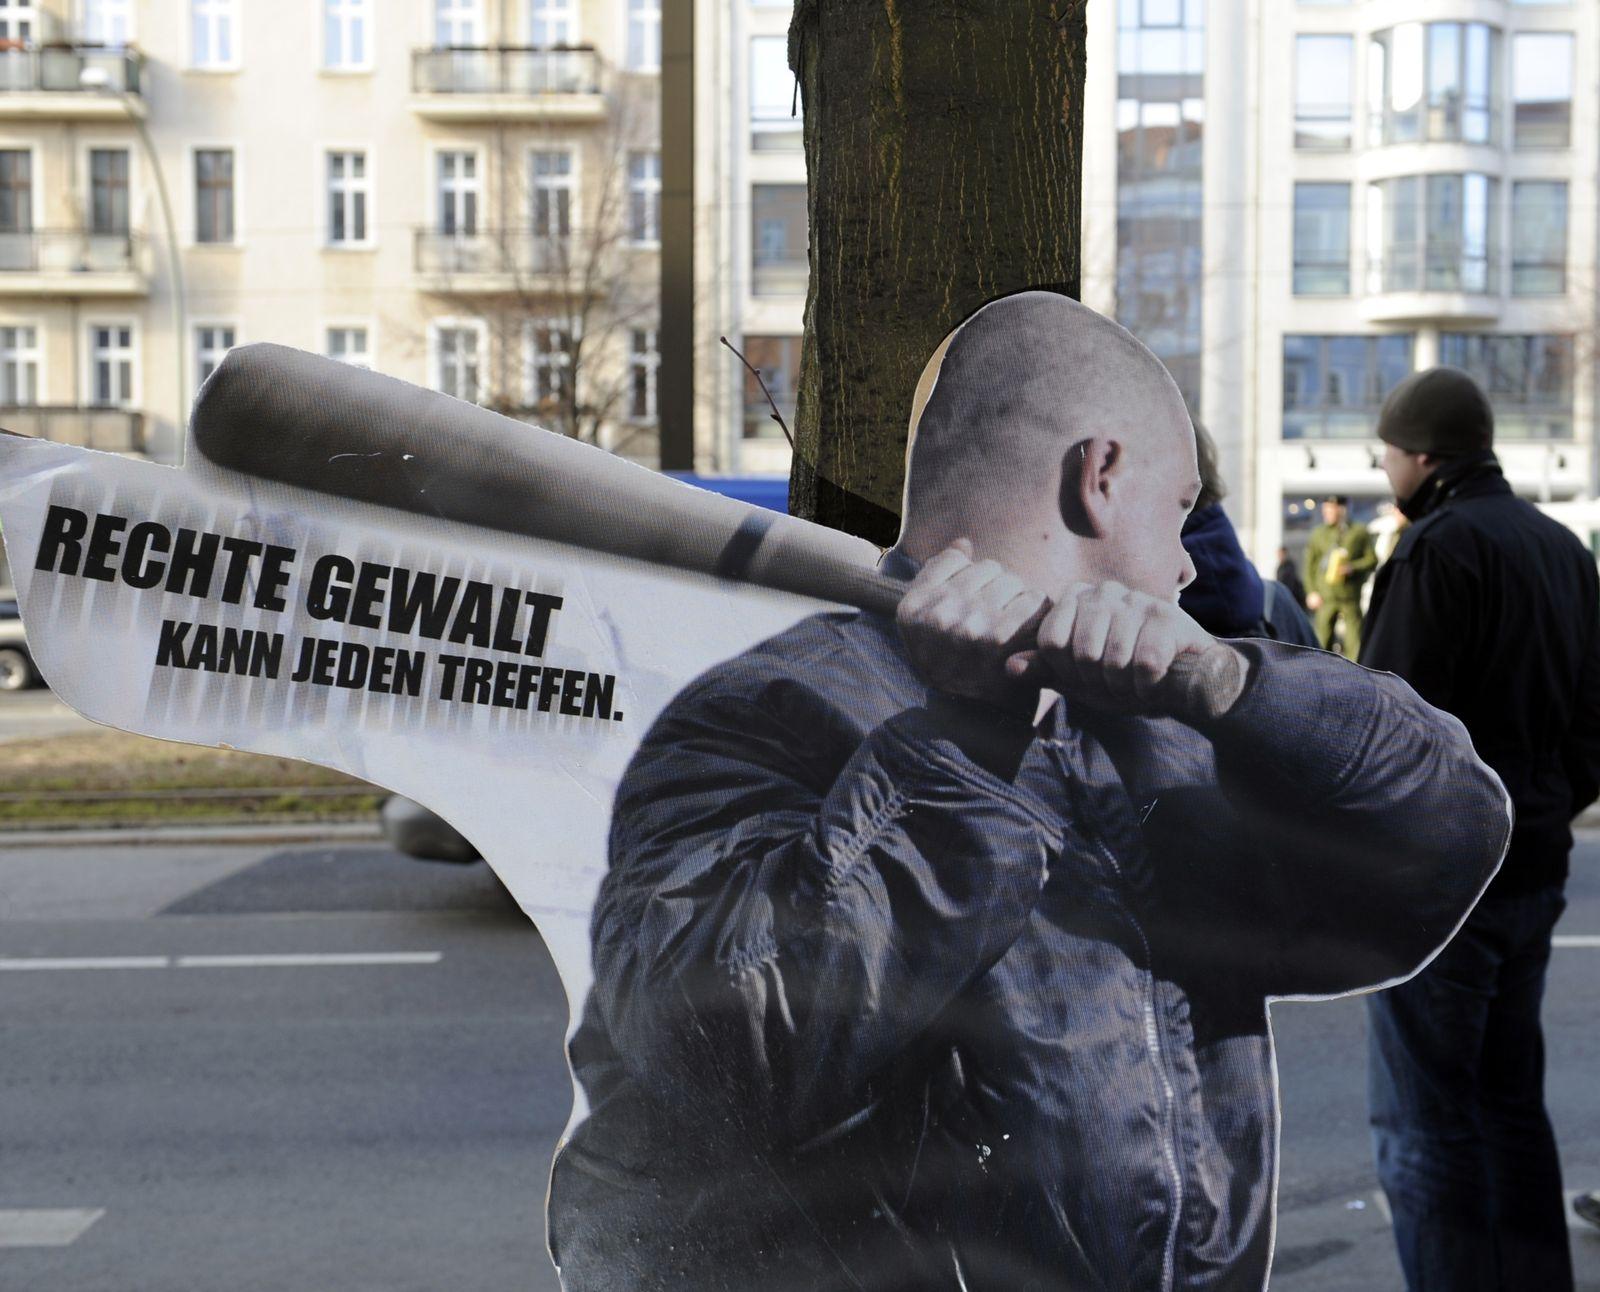 Rechte Gewalt